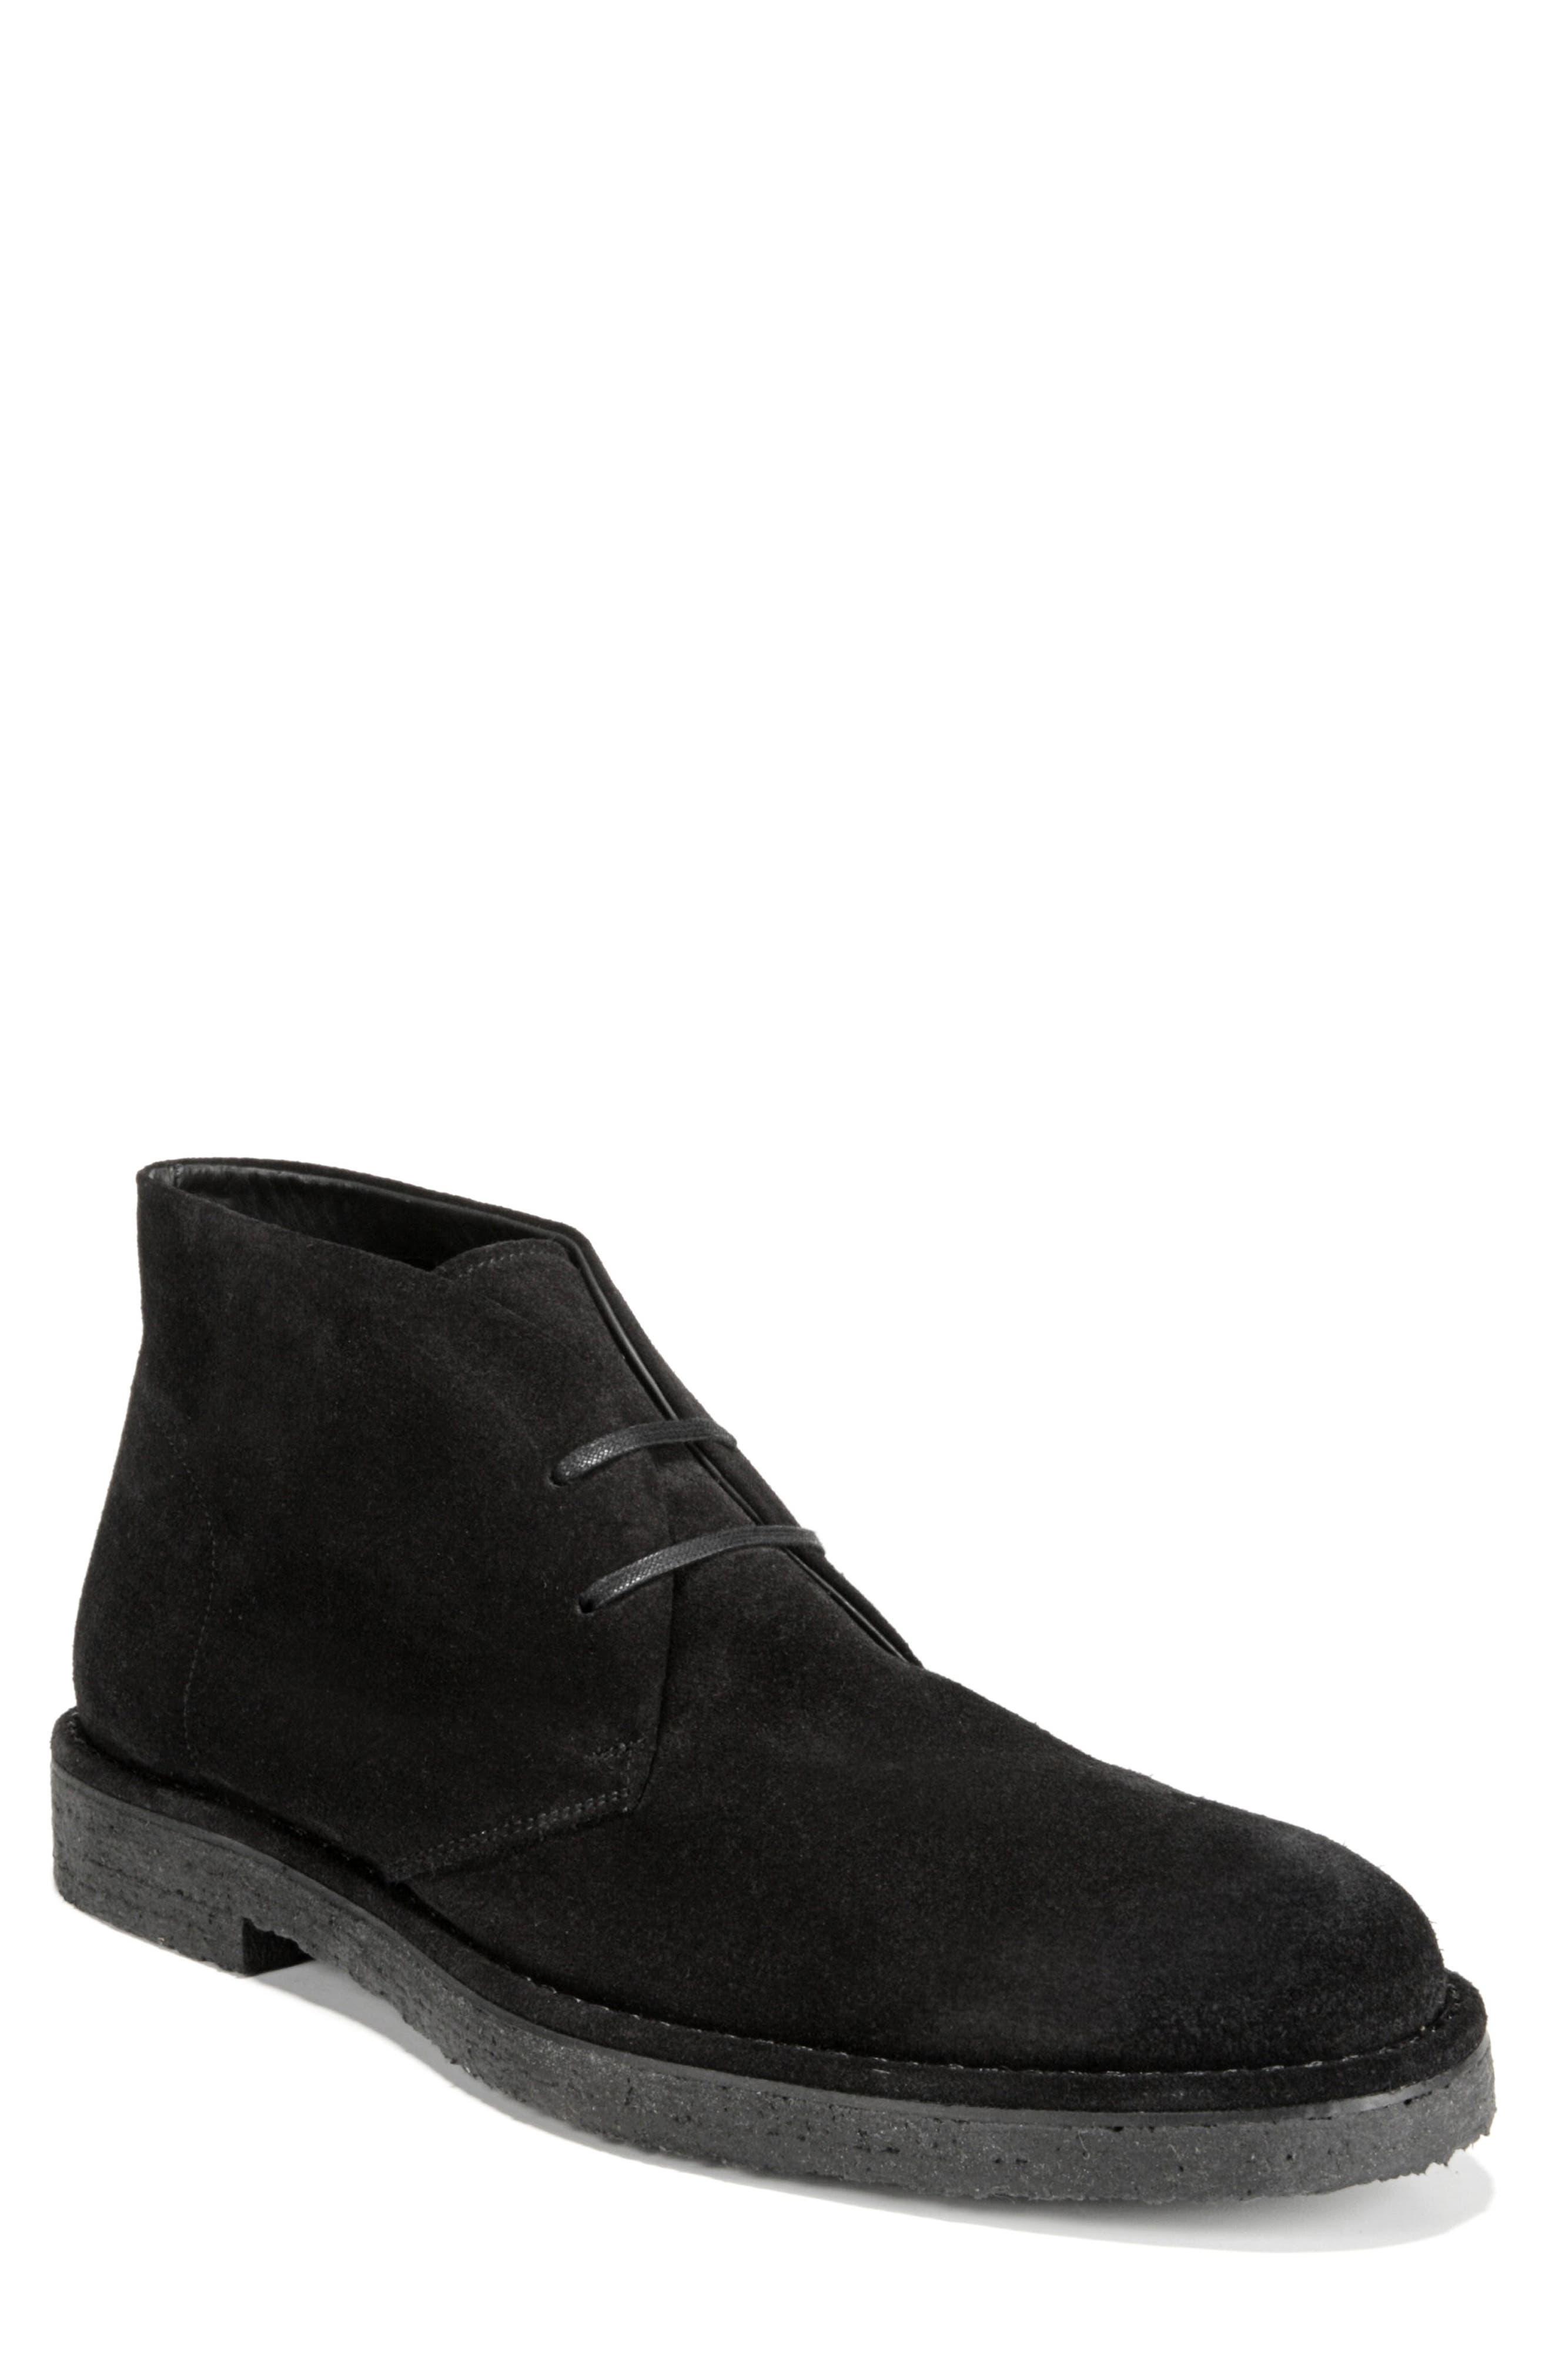 Crofton Chukka Boot,                         Main,                         color, BLACK